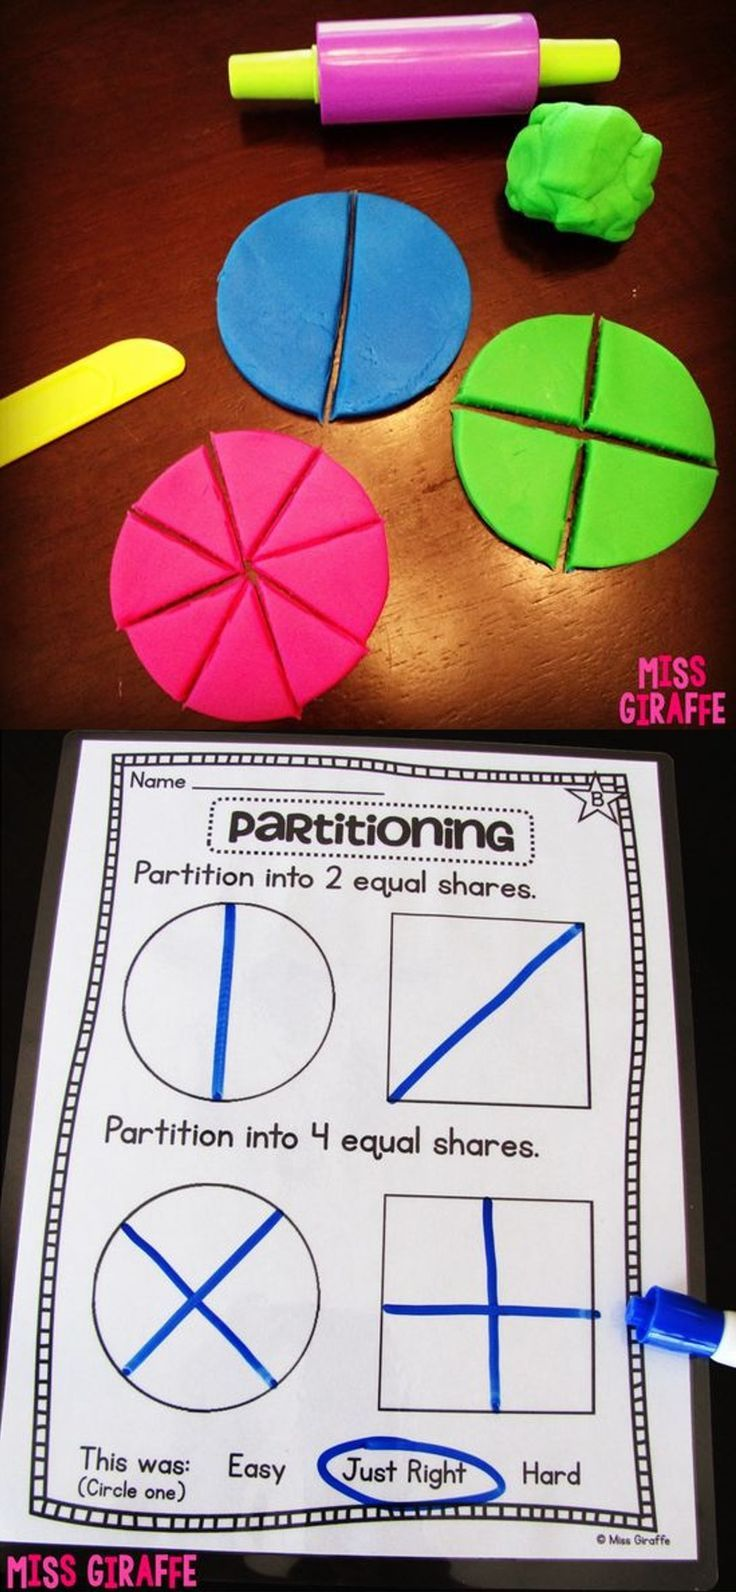 Fractions In First Grade 2nd Grade Activities Geometry 2nd Grade Activities Fraction Activities